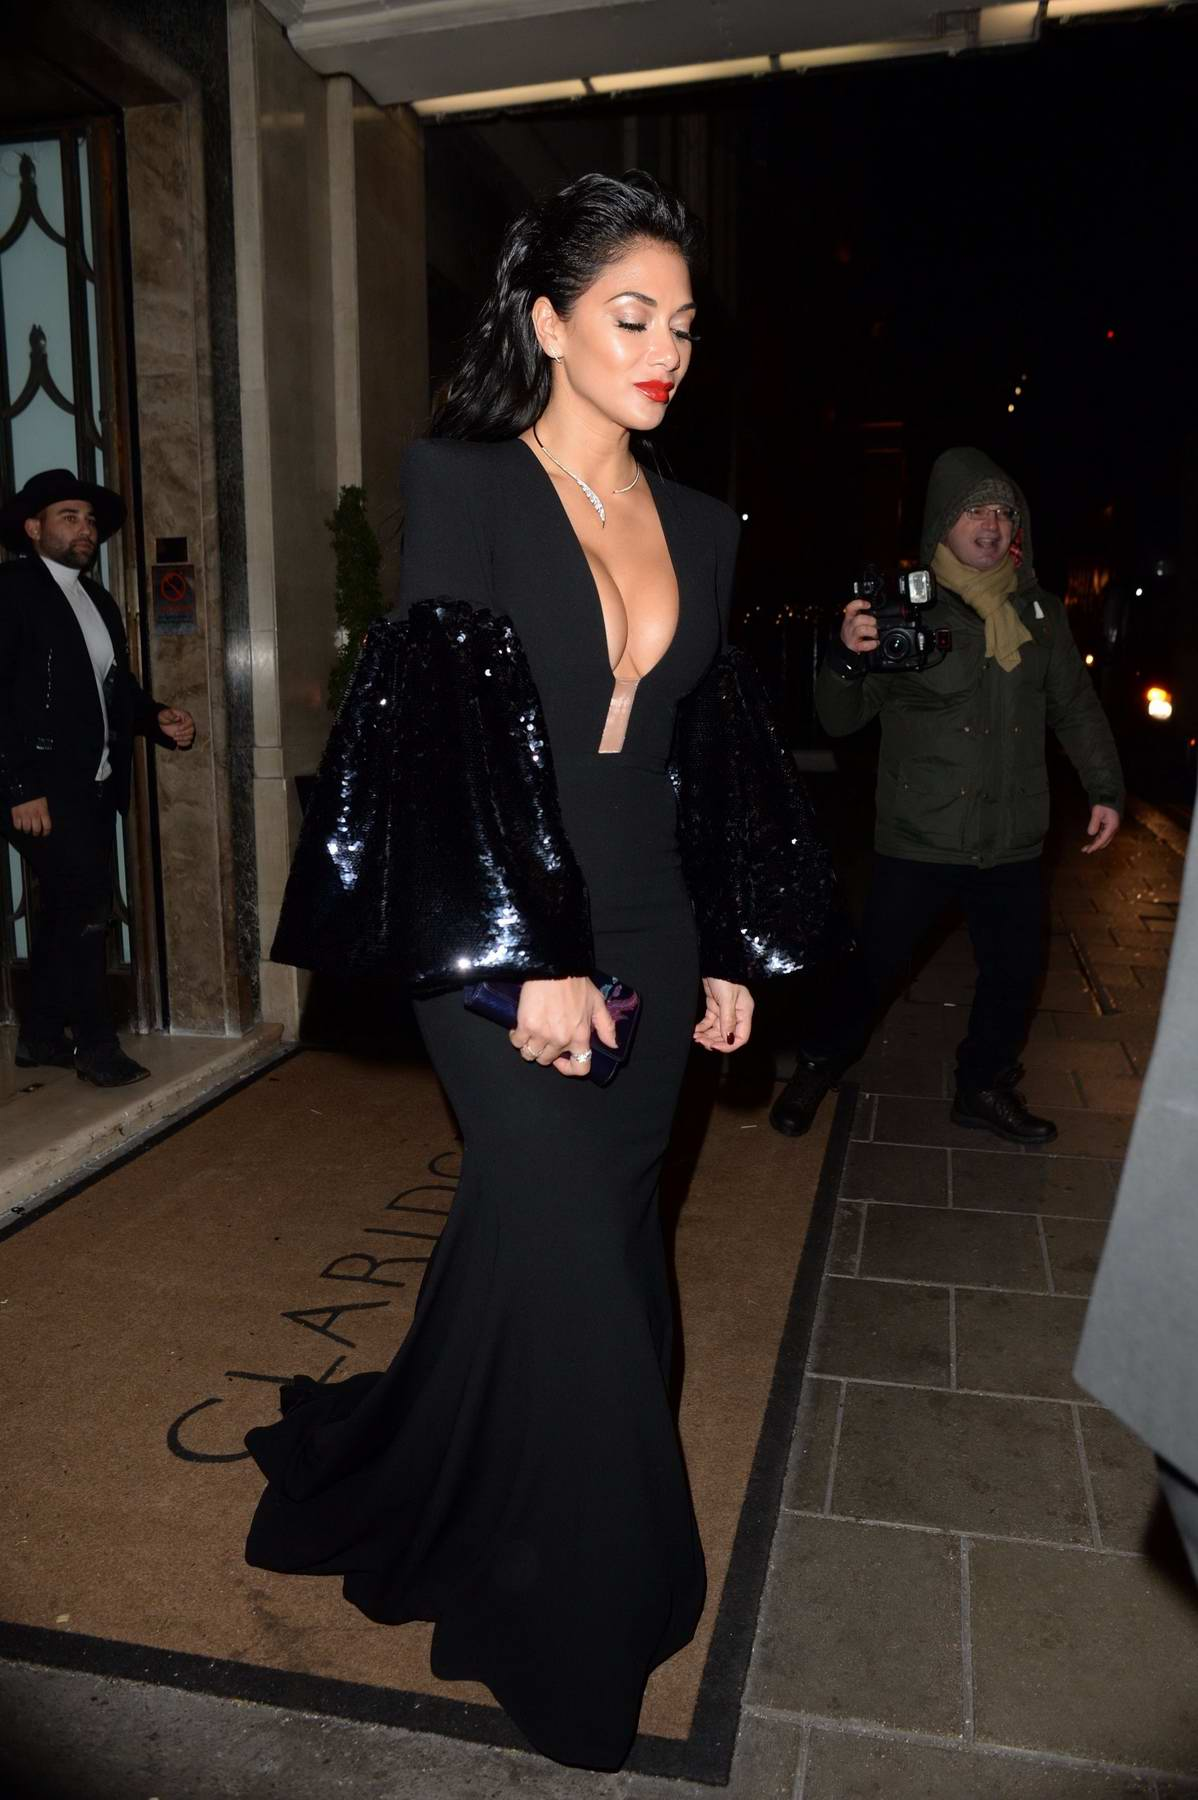 Nicole Scherzinger leaving Brilliant Is Beautiful - VIP Gala fundraiser in London